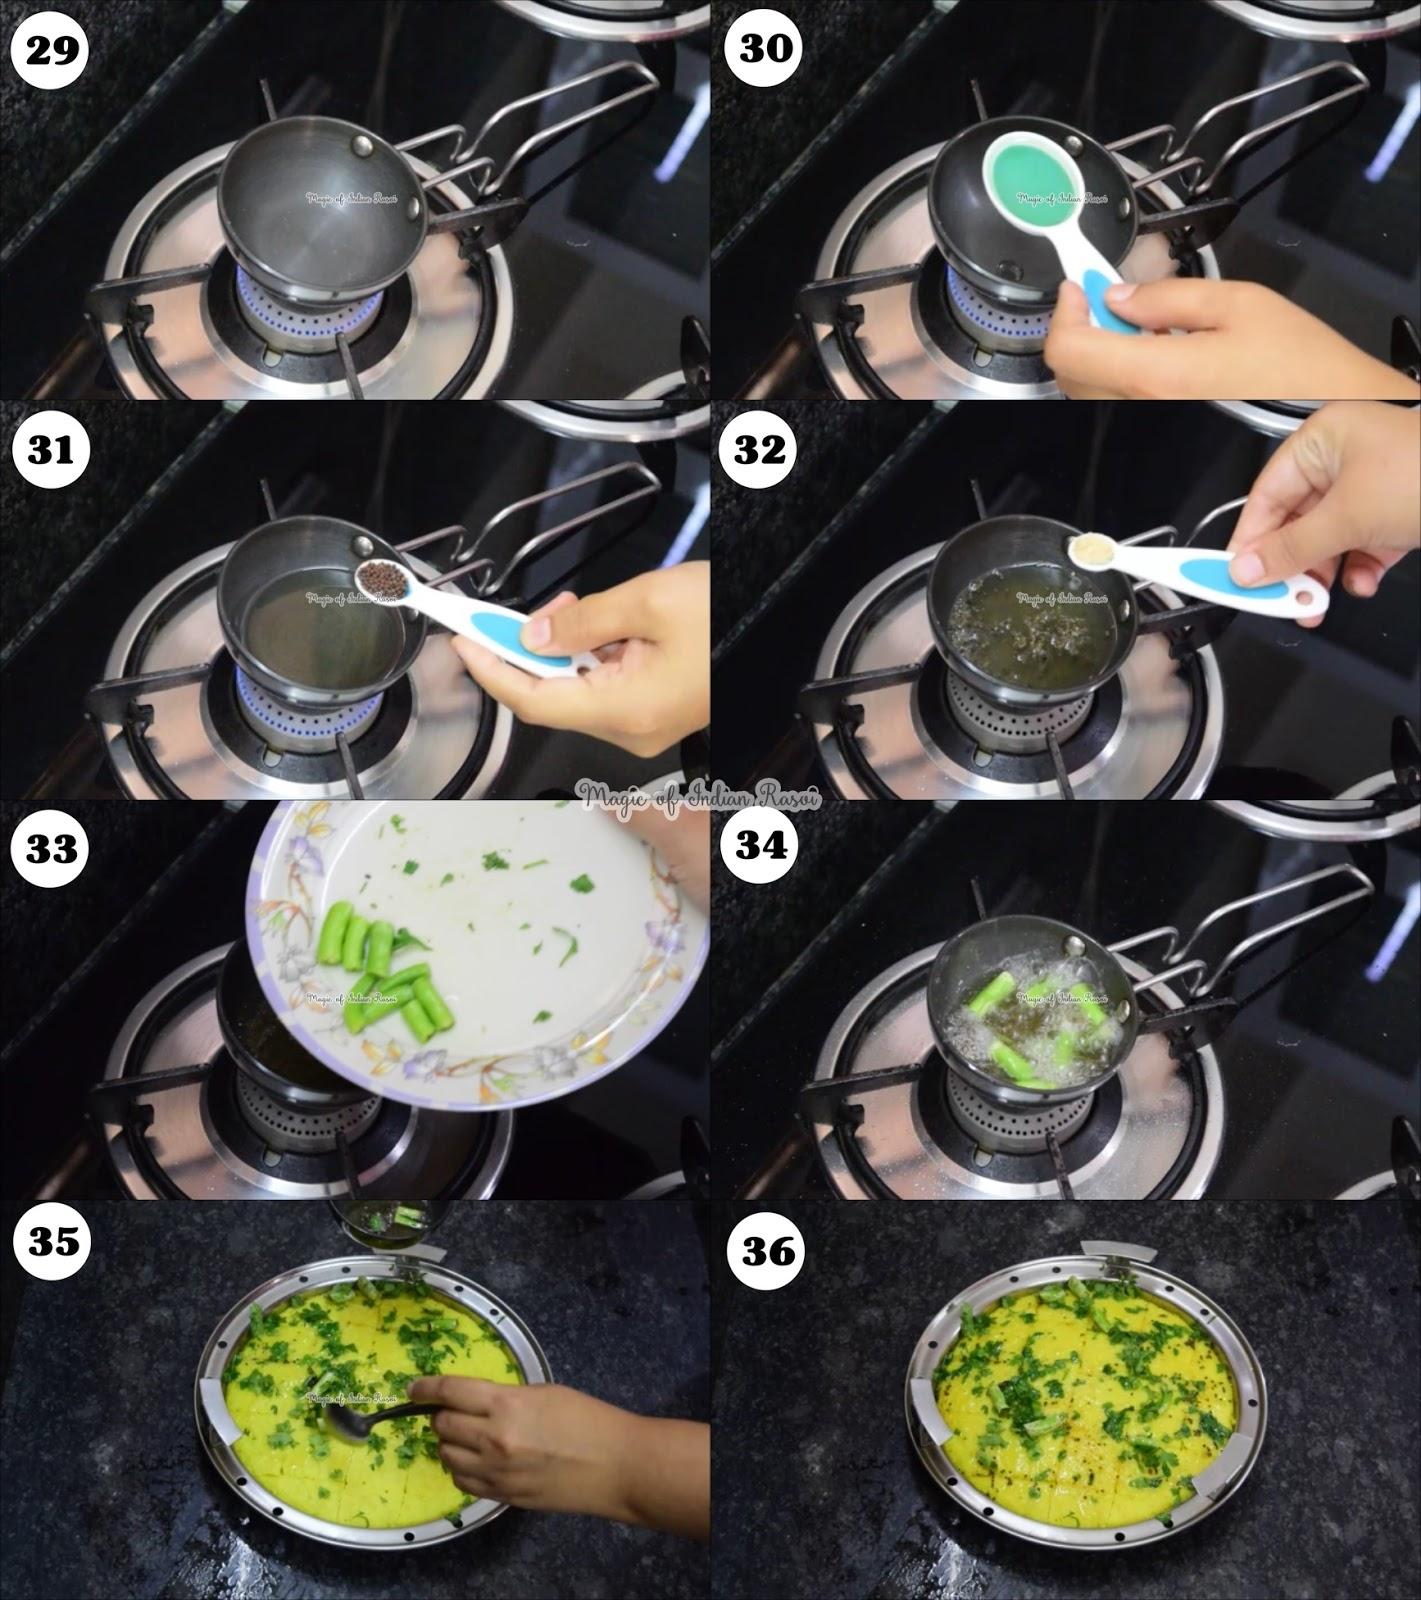 Rice & Chana Dal Dhokla - Khaman Dhokla - Soft & Spongy Recipe - चावल और चना दाल का खमण ढोकला  रेसिपी - Priya R - Magic of Indian Rasoi